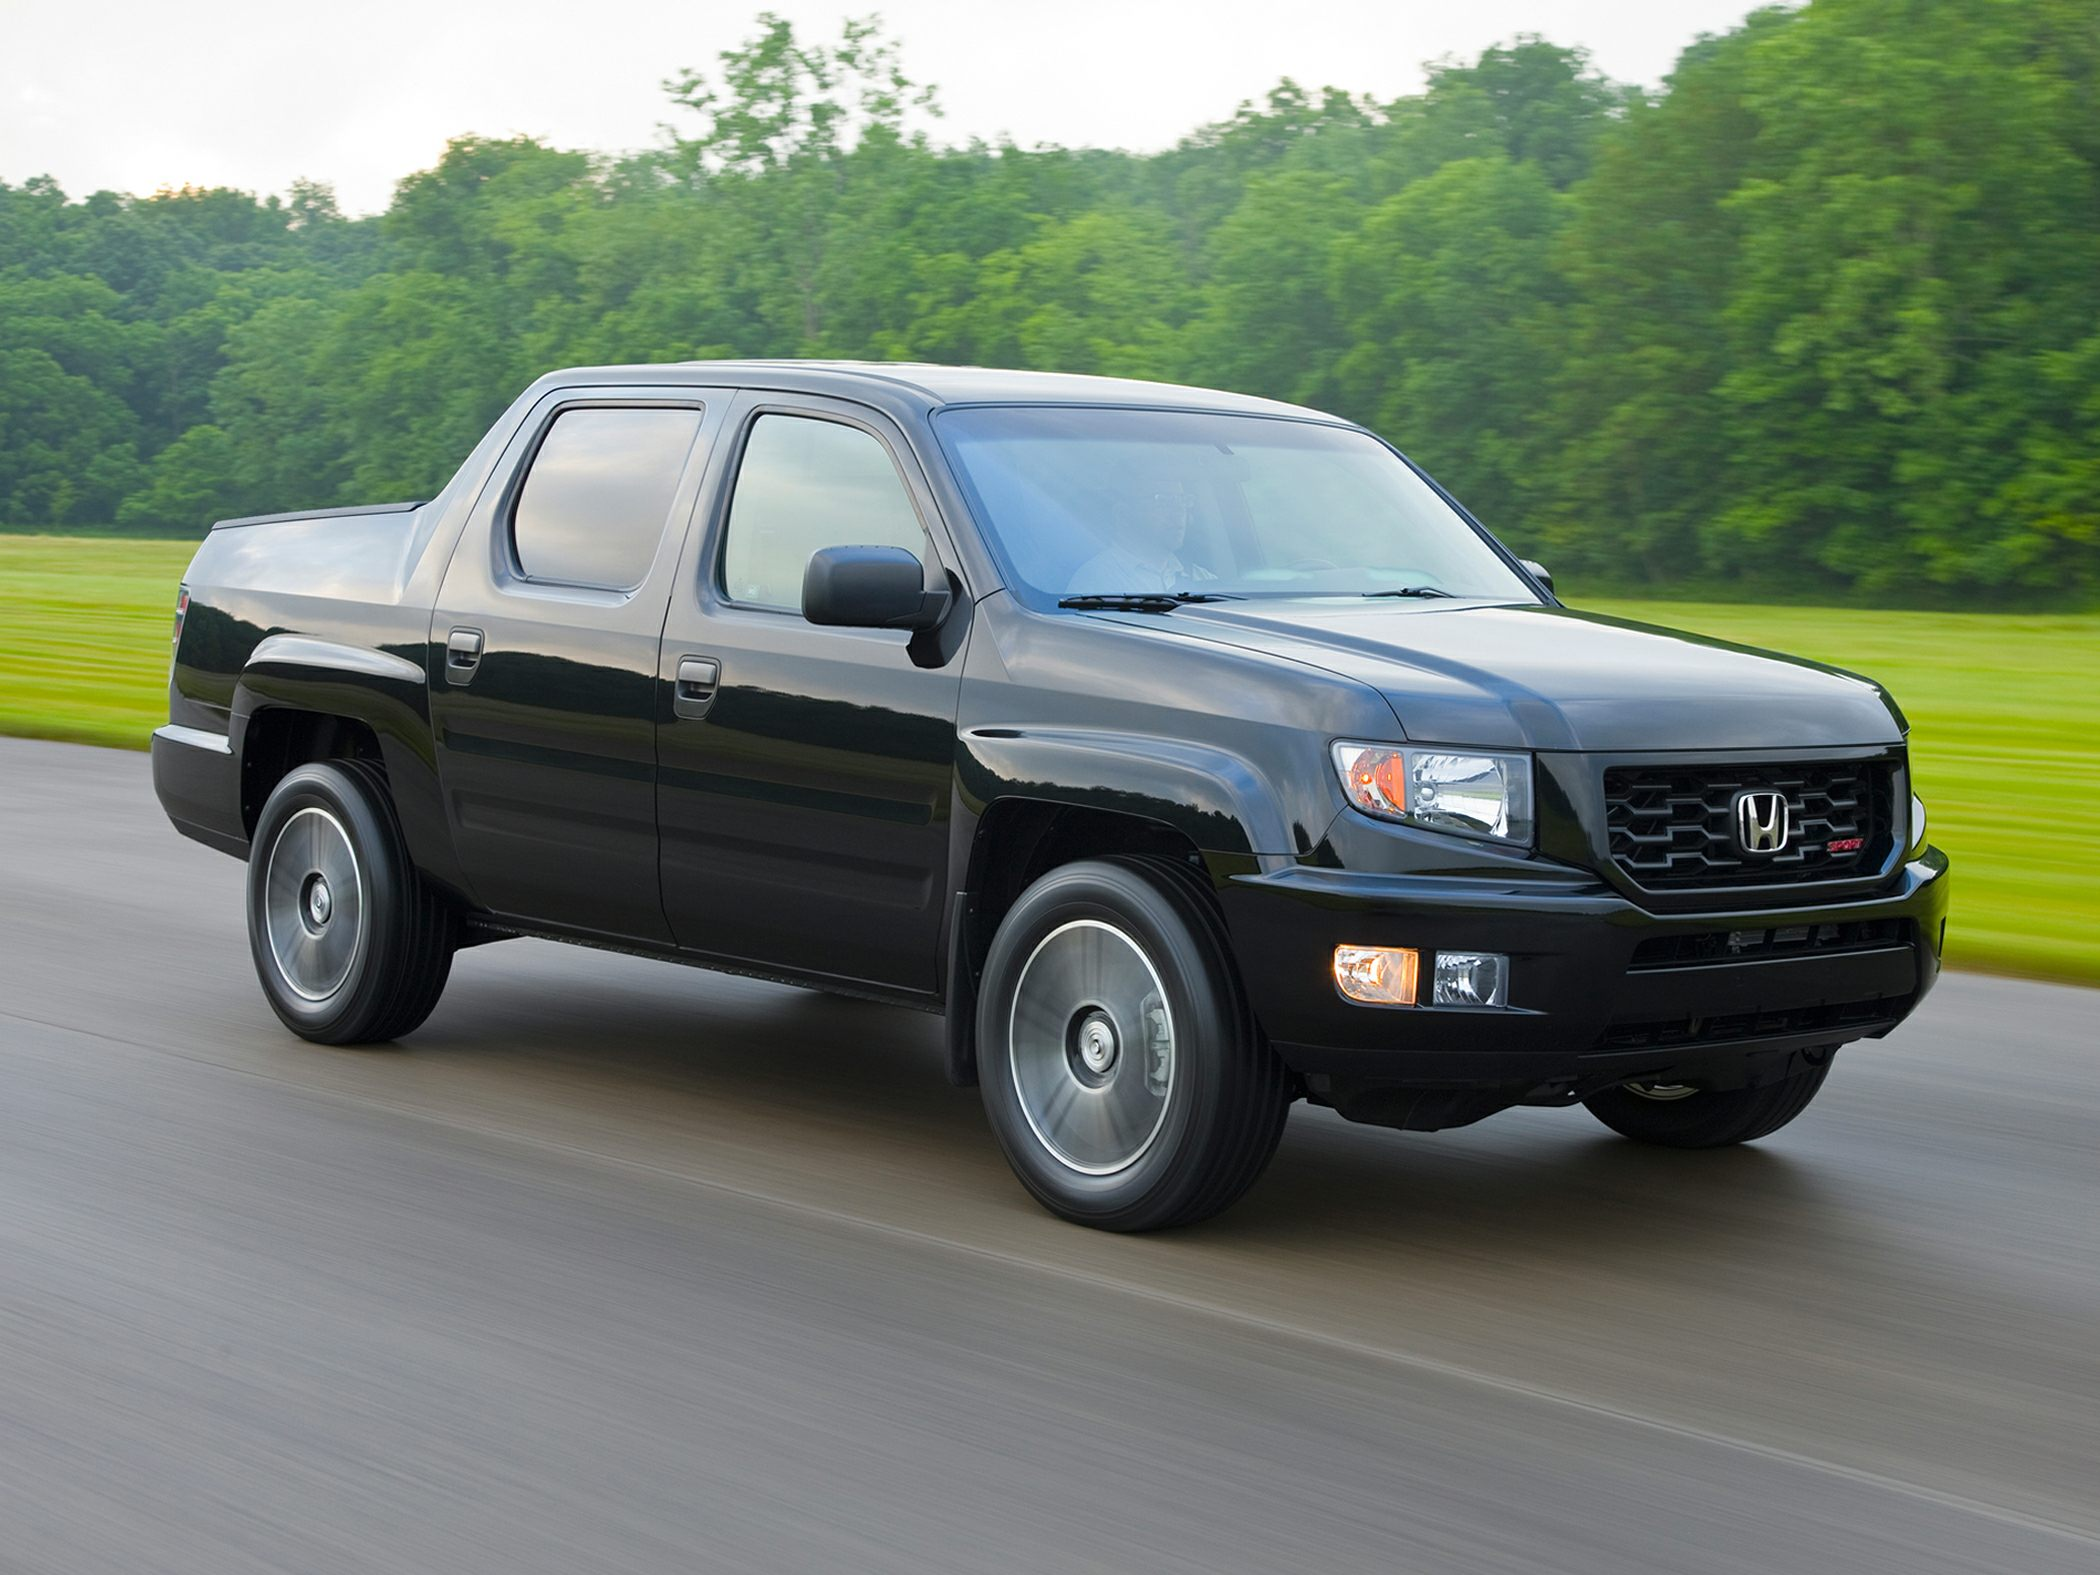 2014 Honda Ridgeline Glam